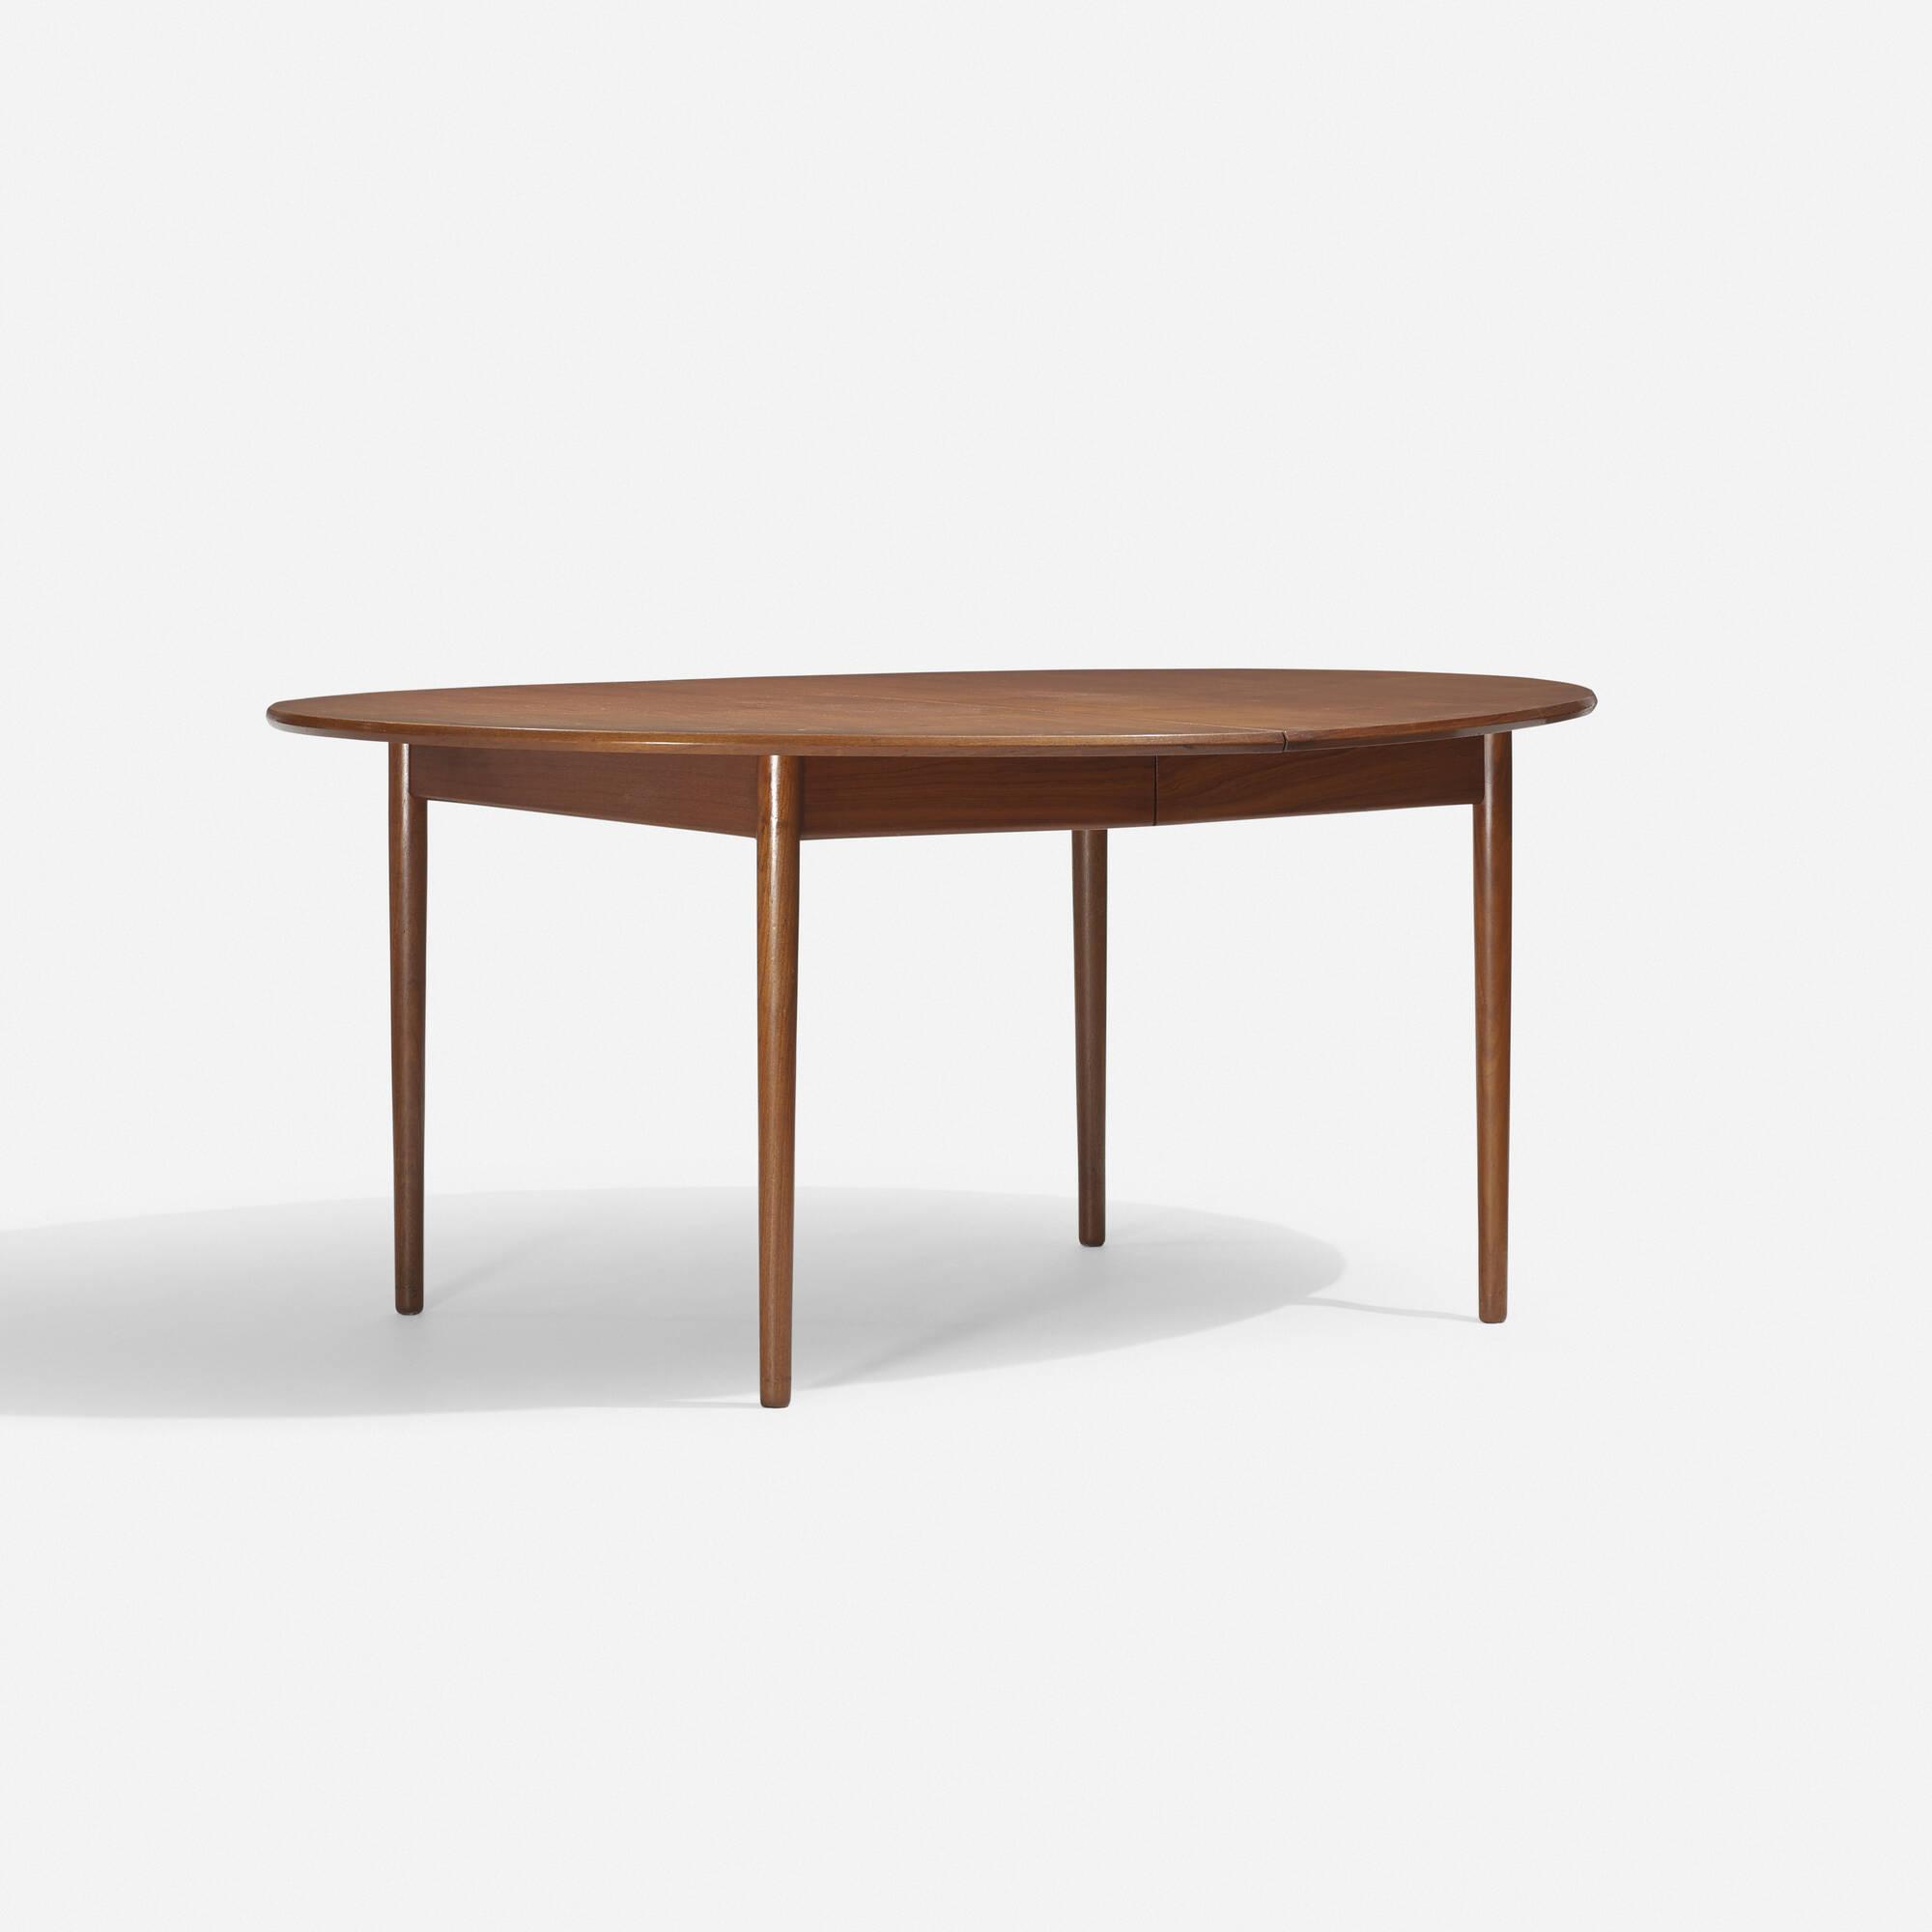 396: Ib Kofod-Larsen / dining table (1 of 3)